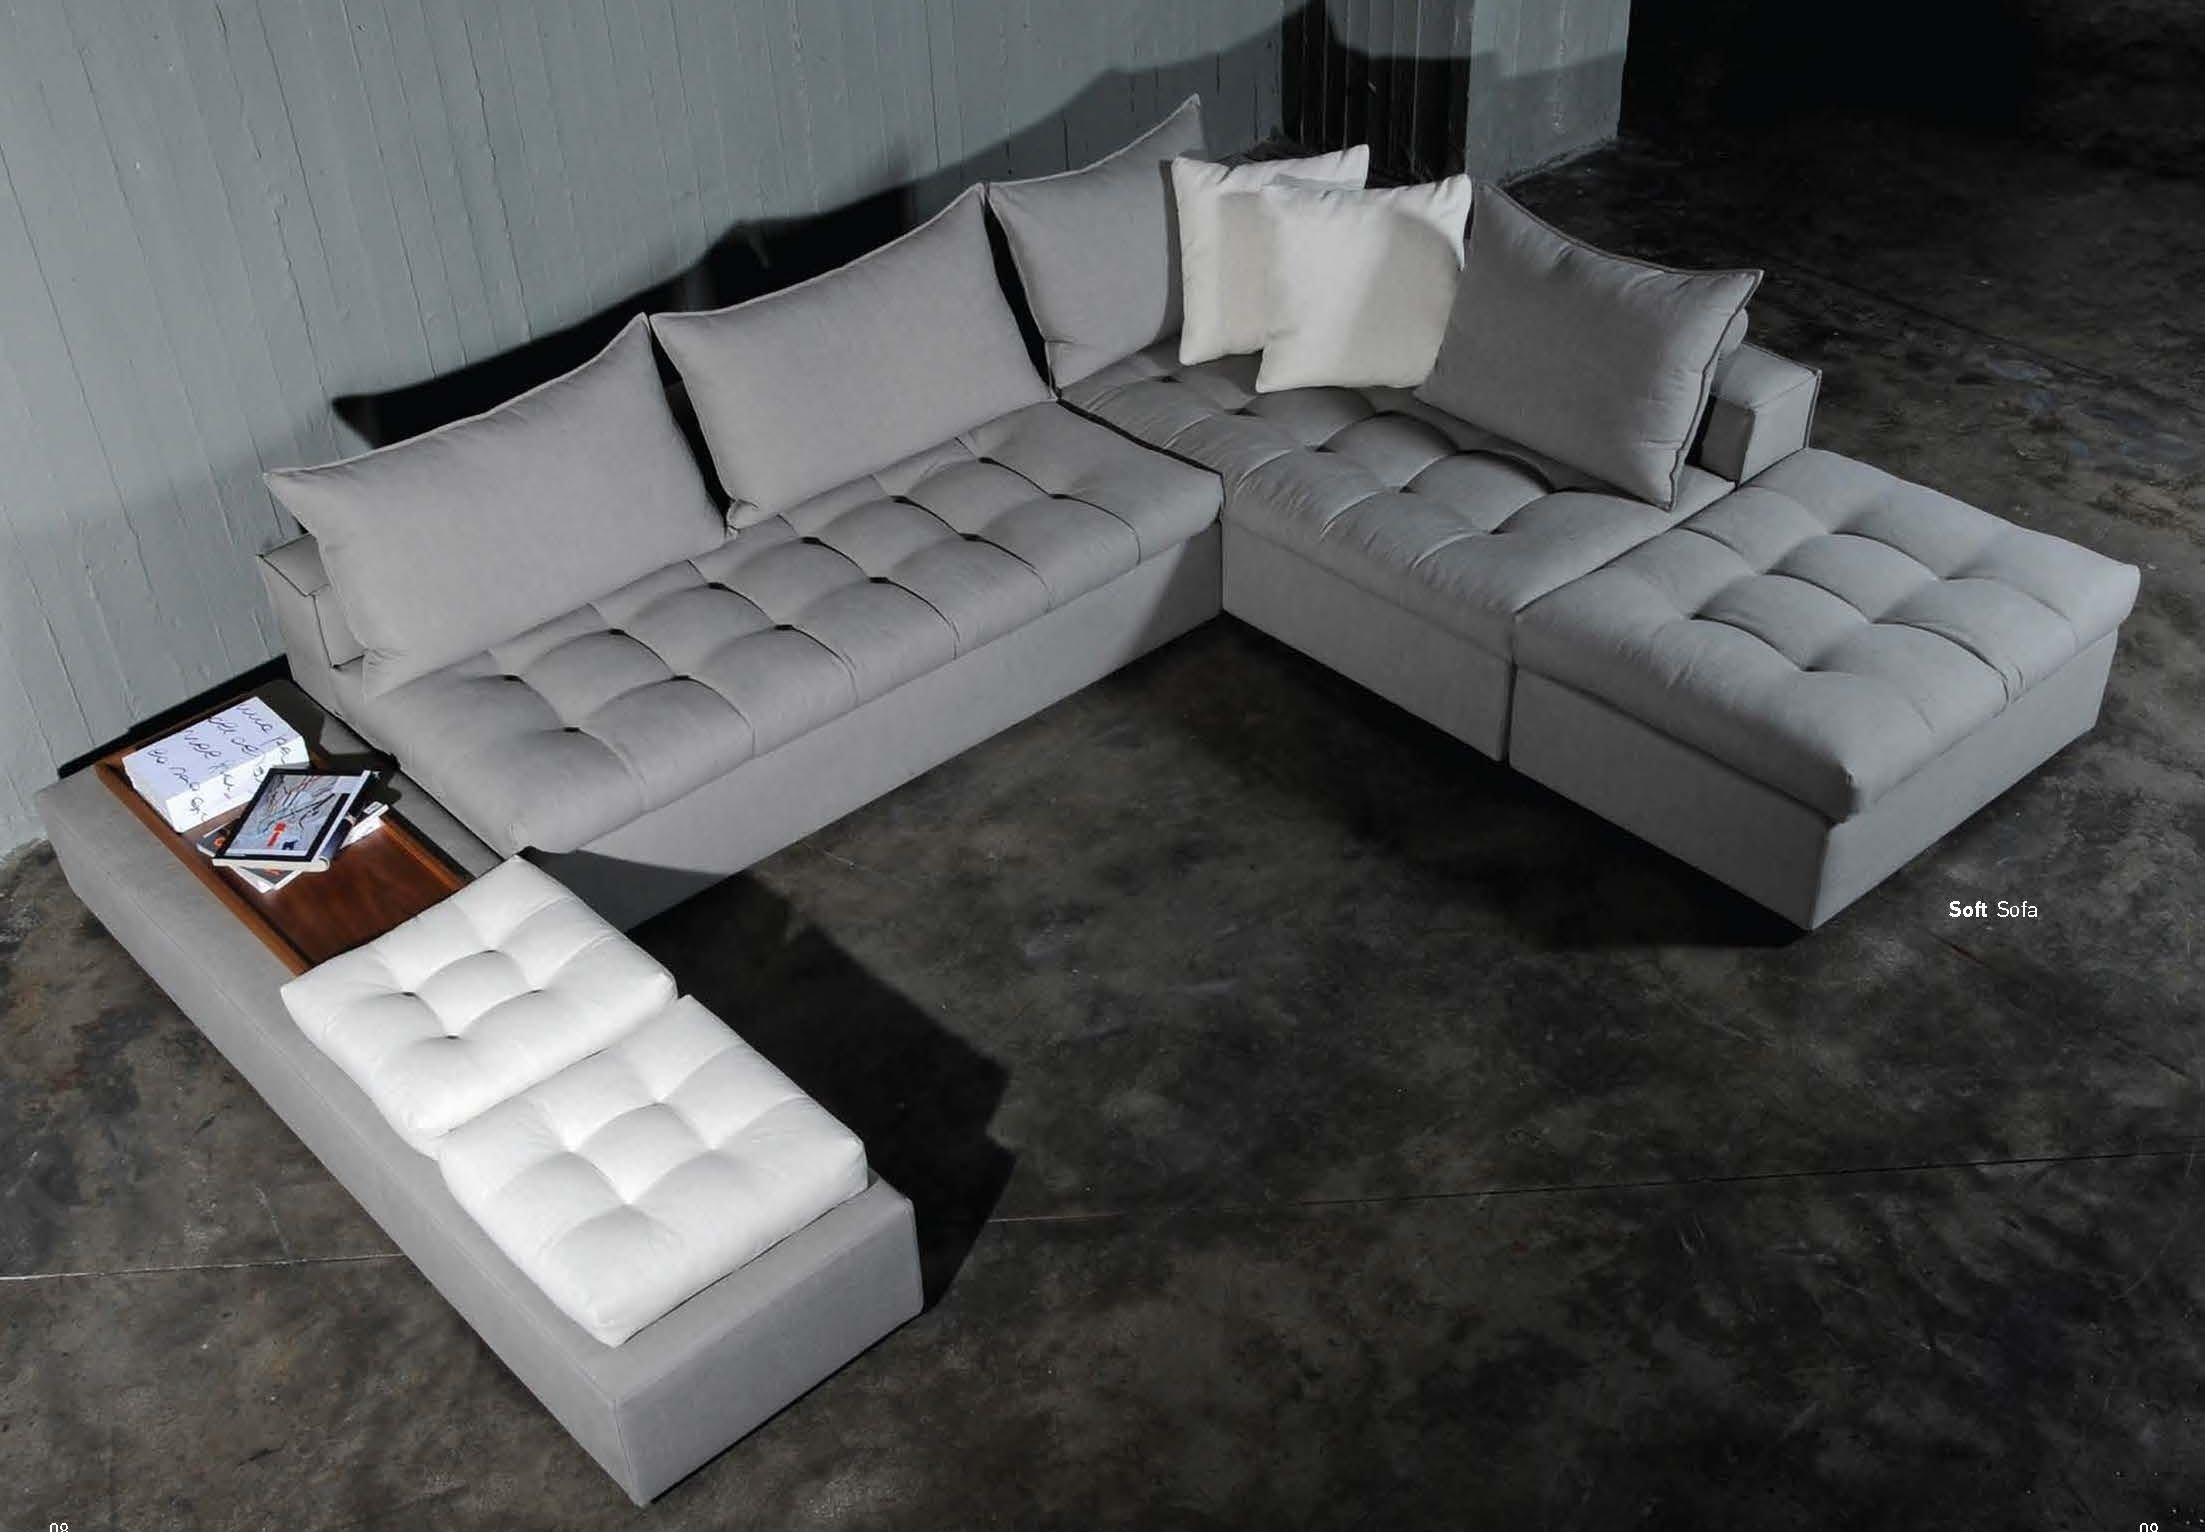 Soft σαλόνι